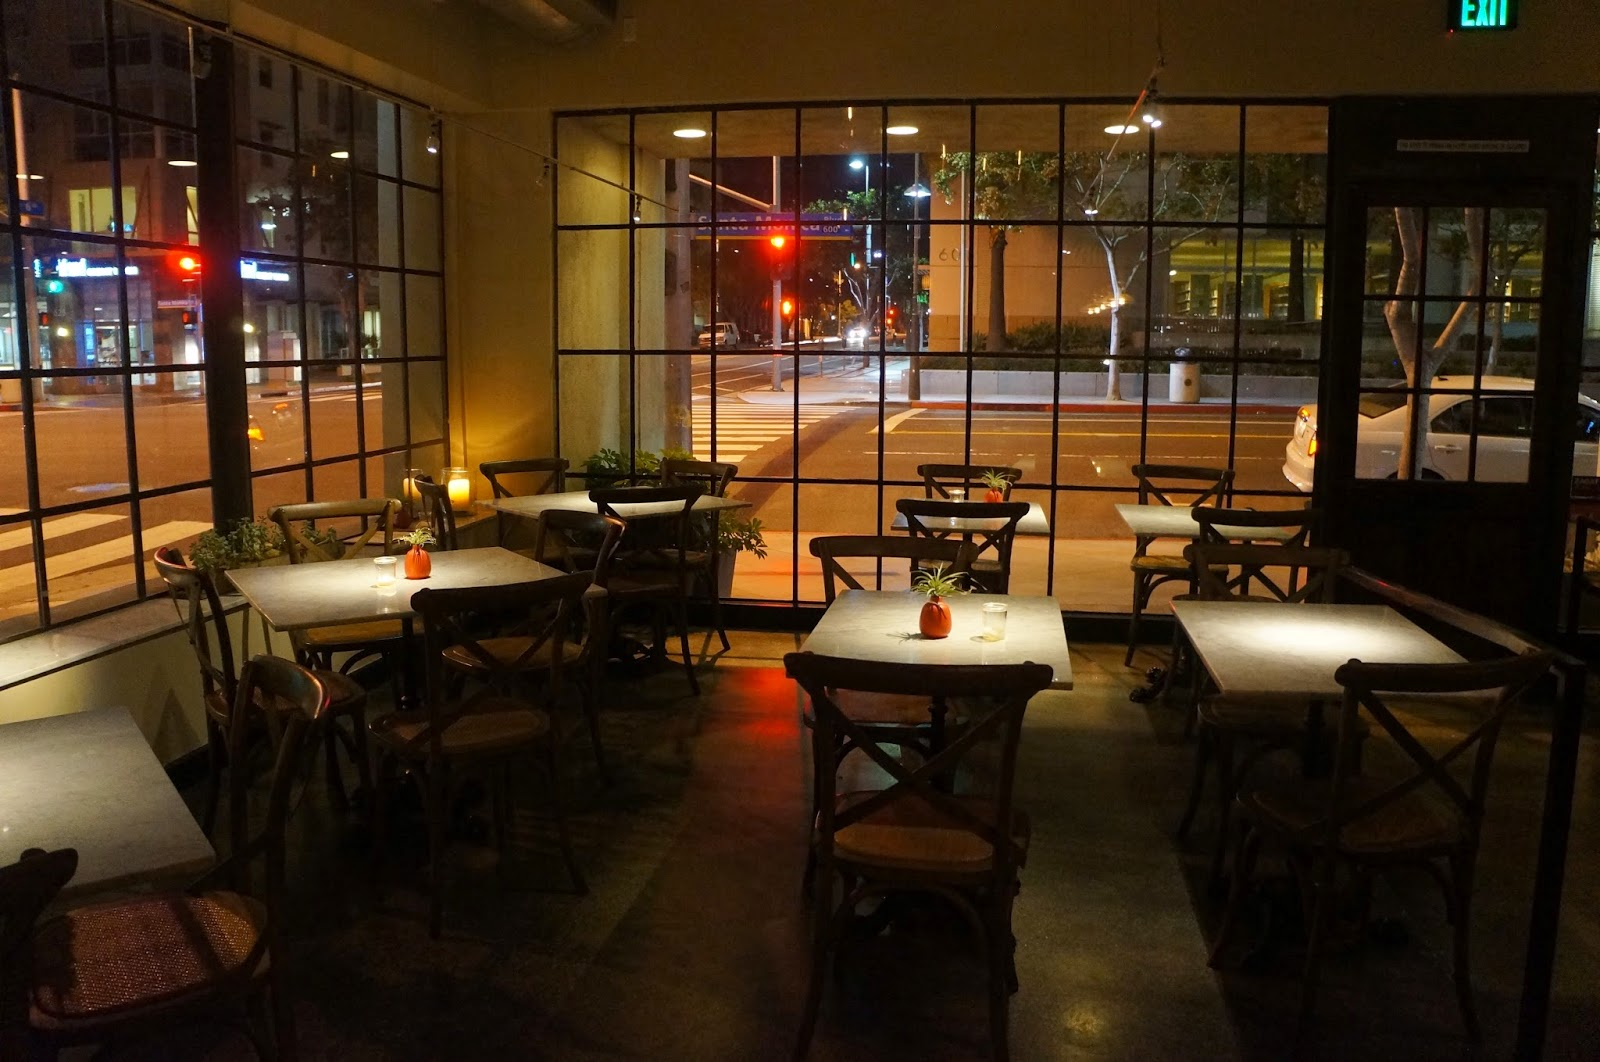 The Food Seeker: TAR AND ROSES (SANTA MONICA, CA)